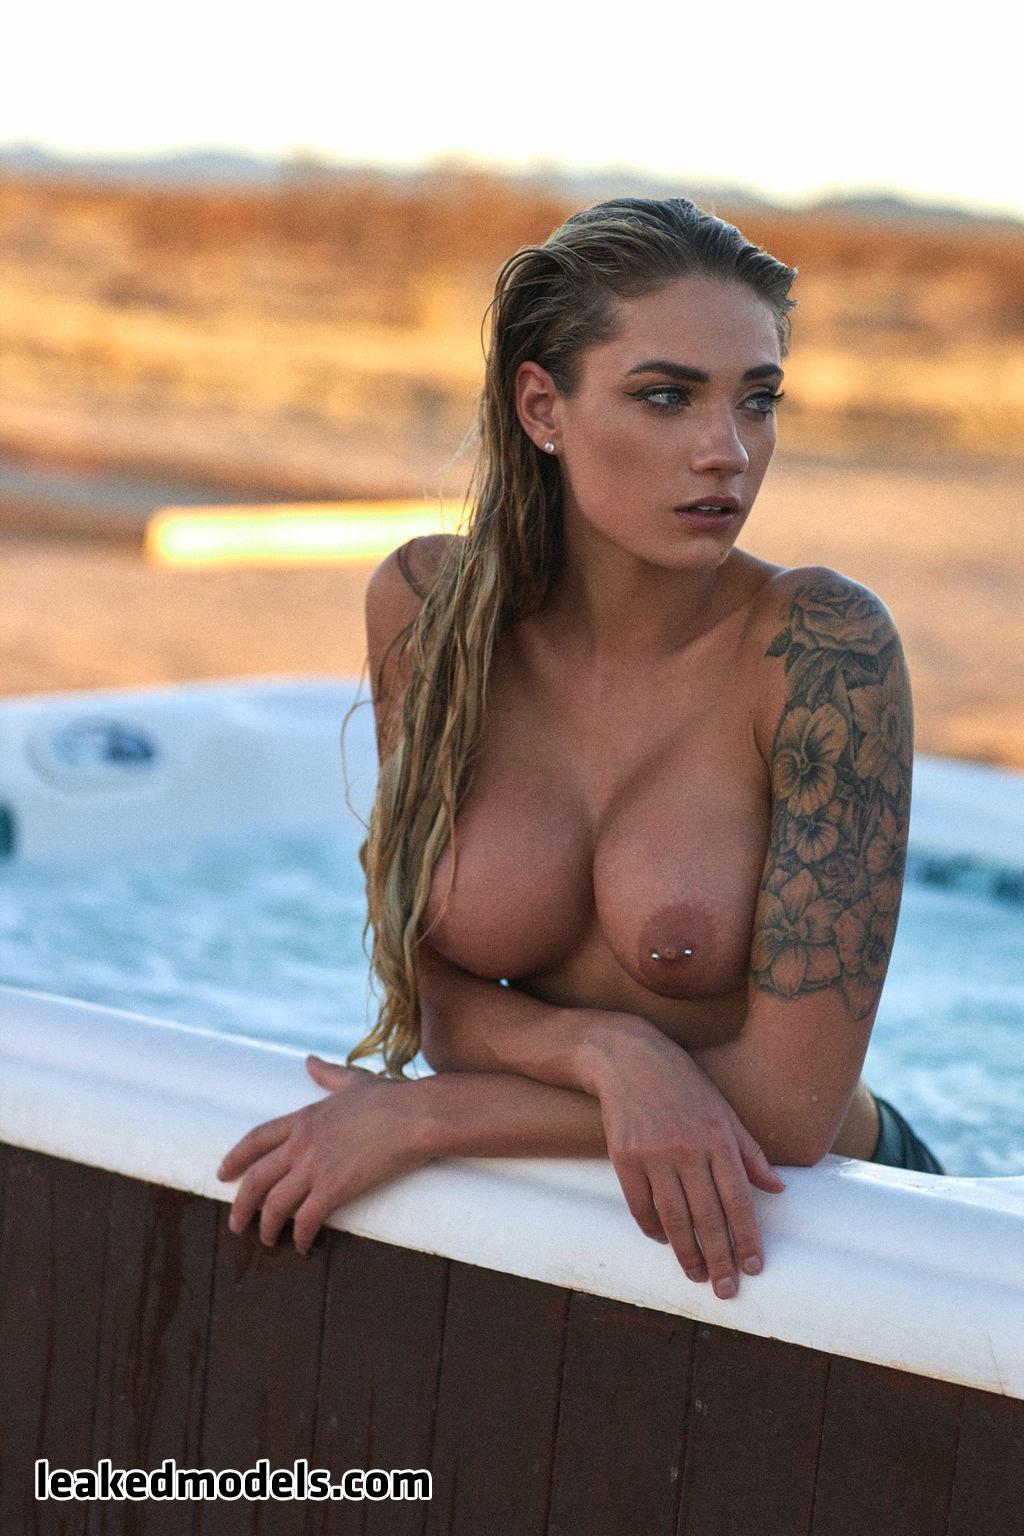 Summer Soderstrom – summersoderstrom OnlyFans Nude Leaks (33 Photos)